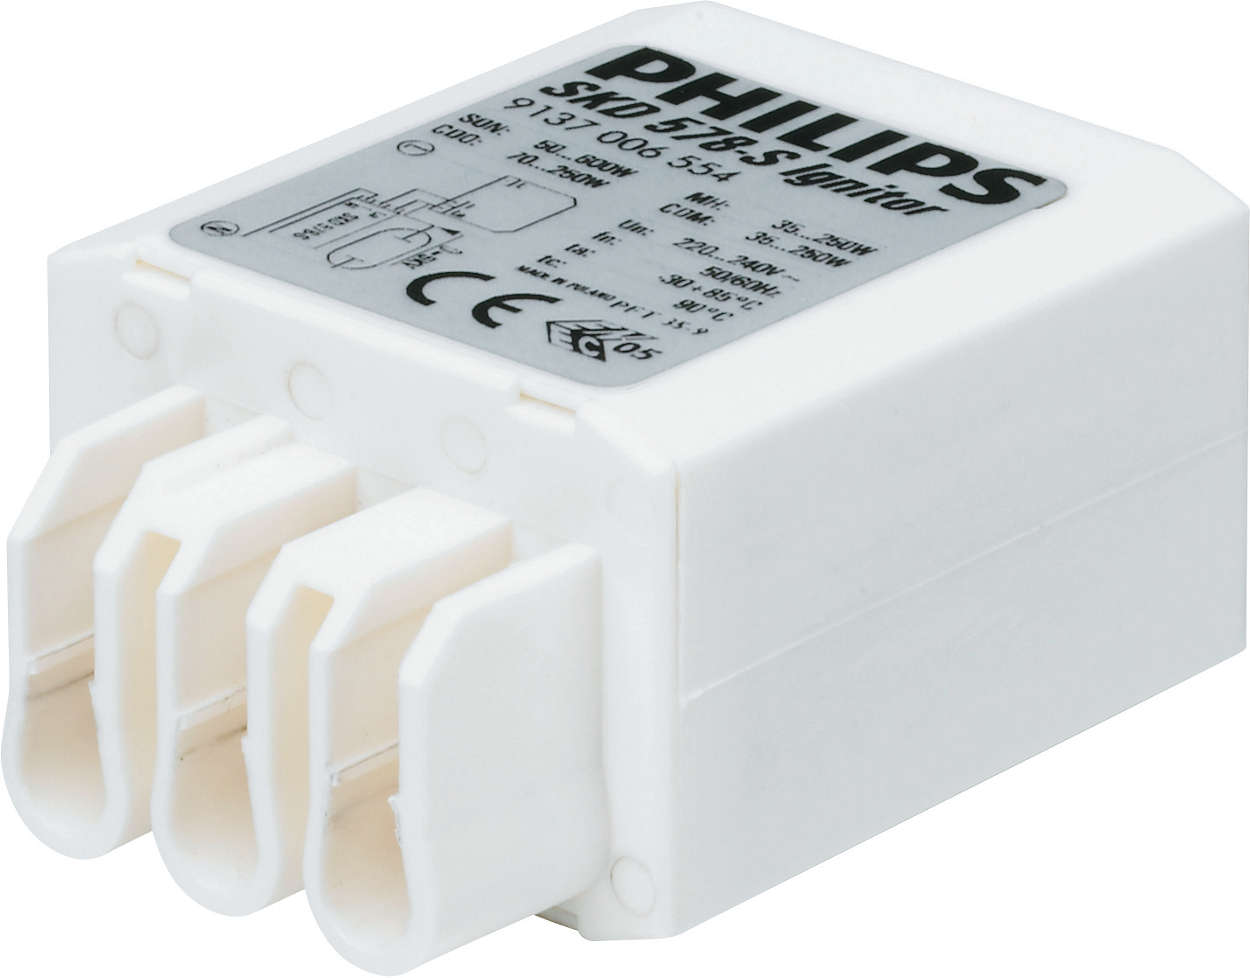 Compact ignitors for flexible luminaire design